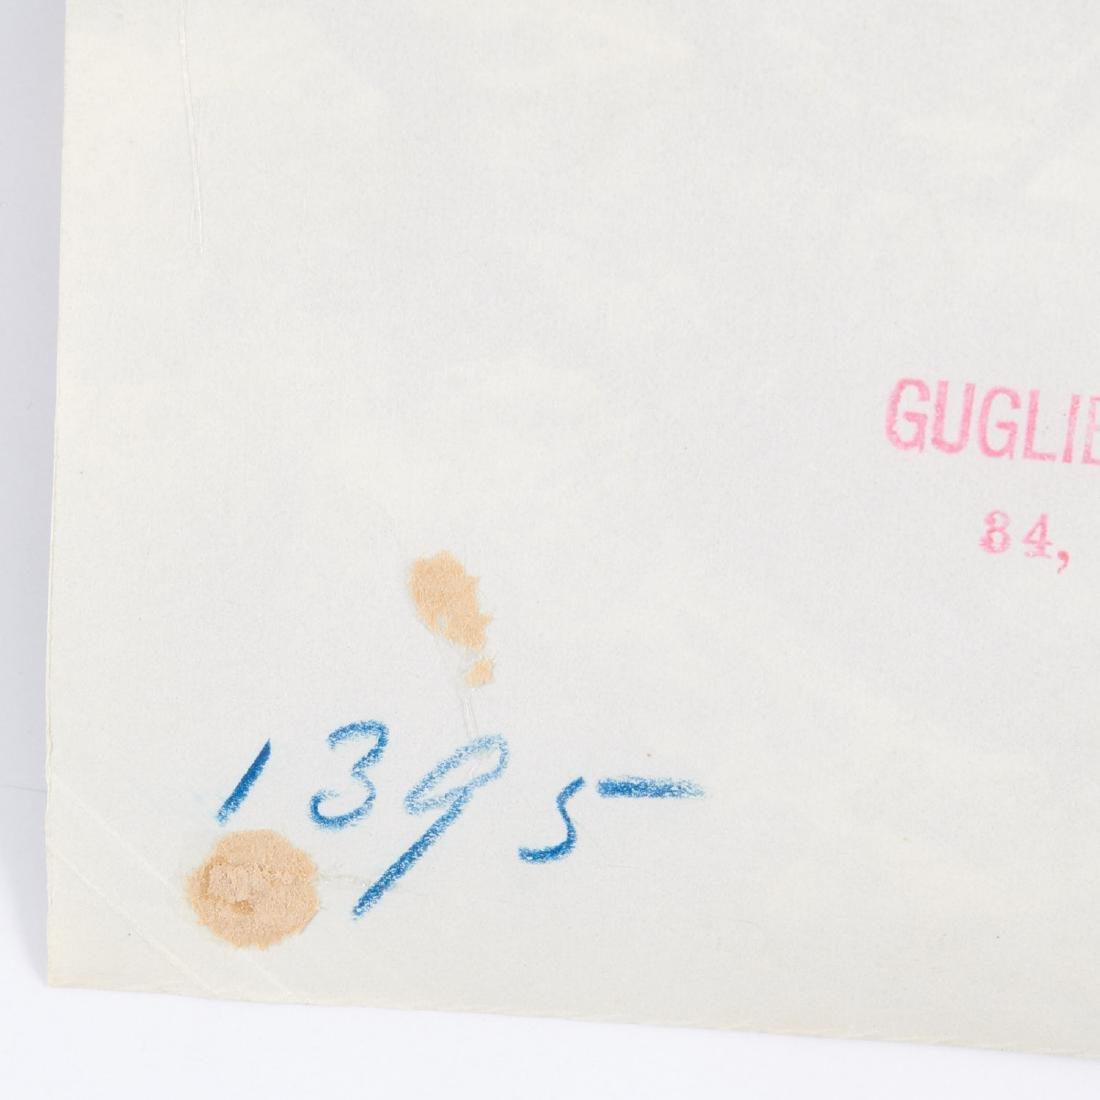 Guglielmo Pluschow, photograph - 6